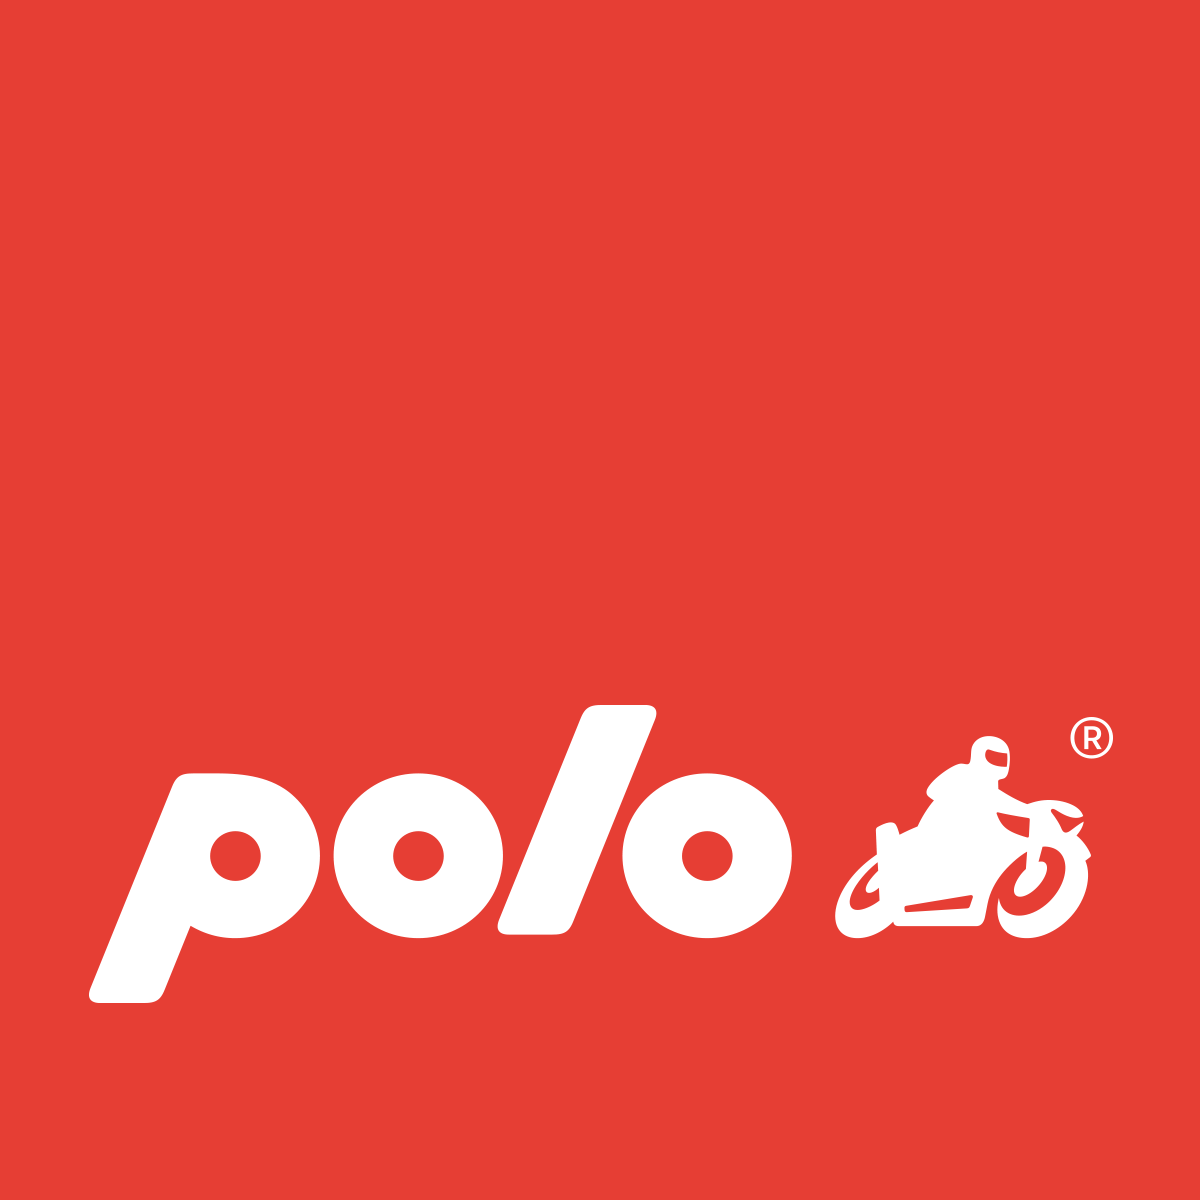 POLO Motorrad Store Magdeburg